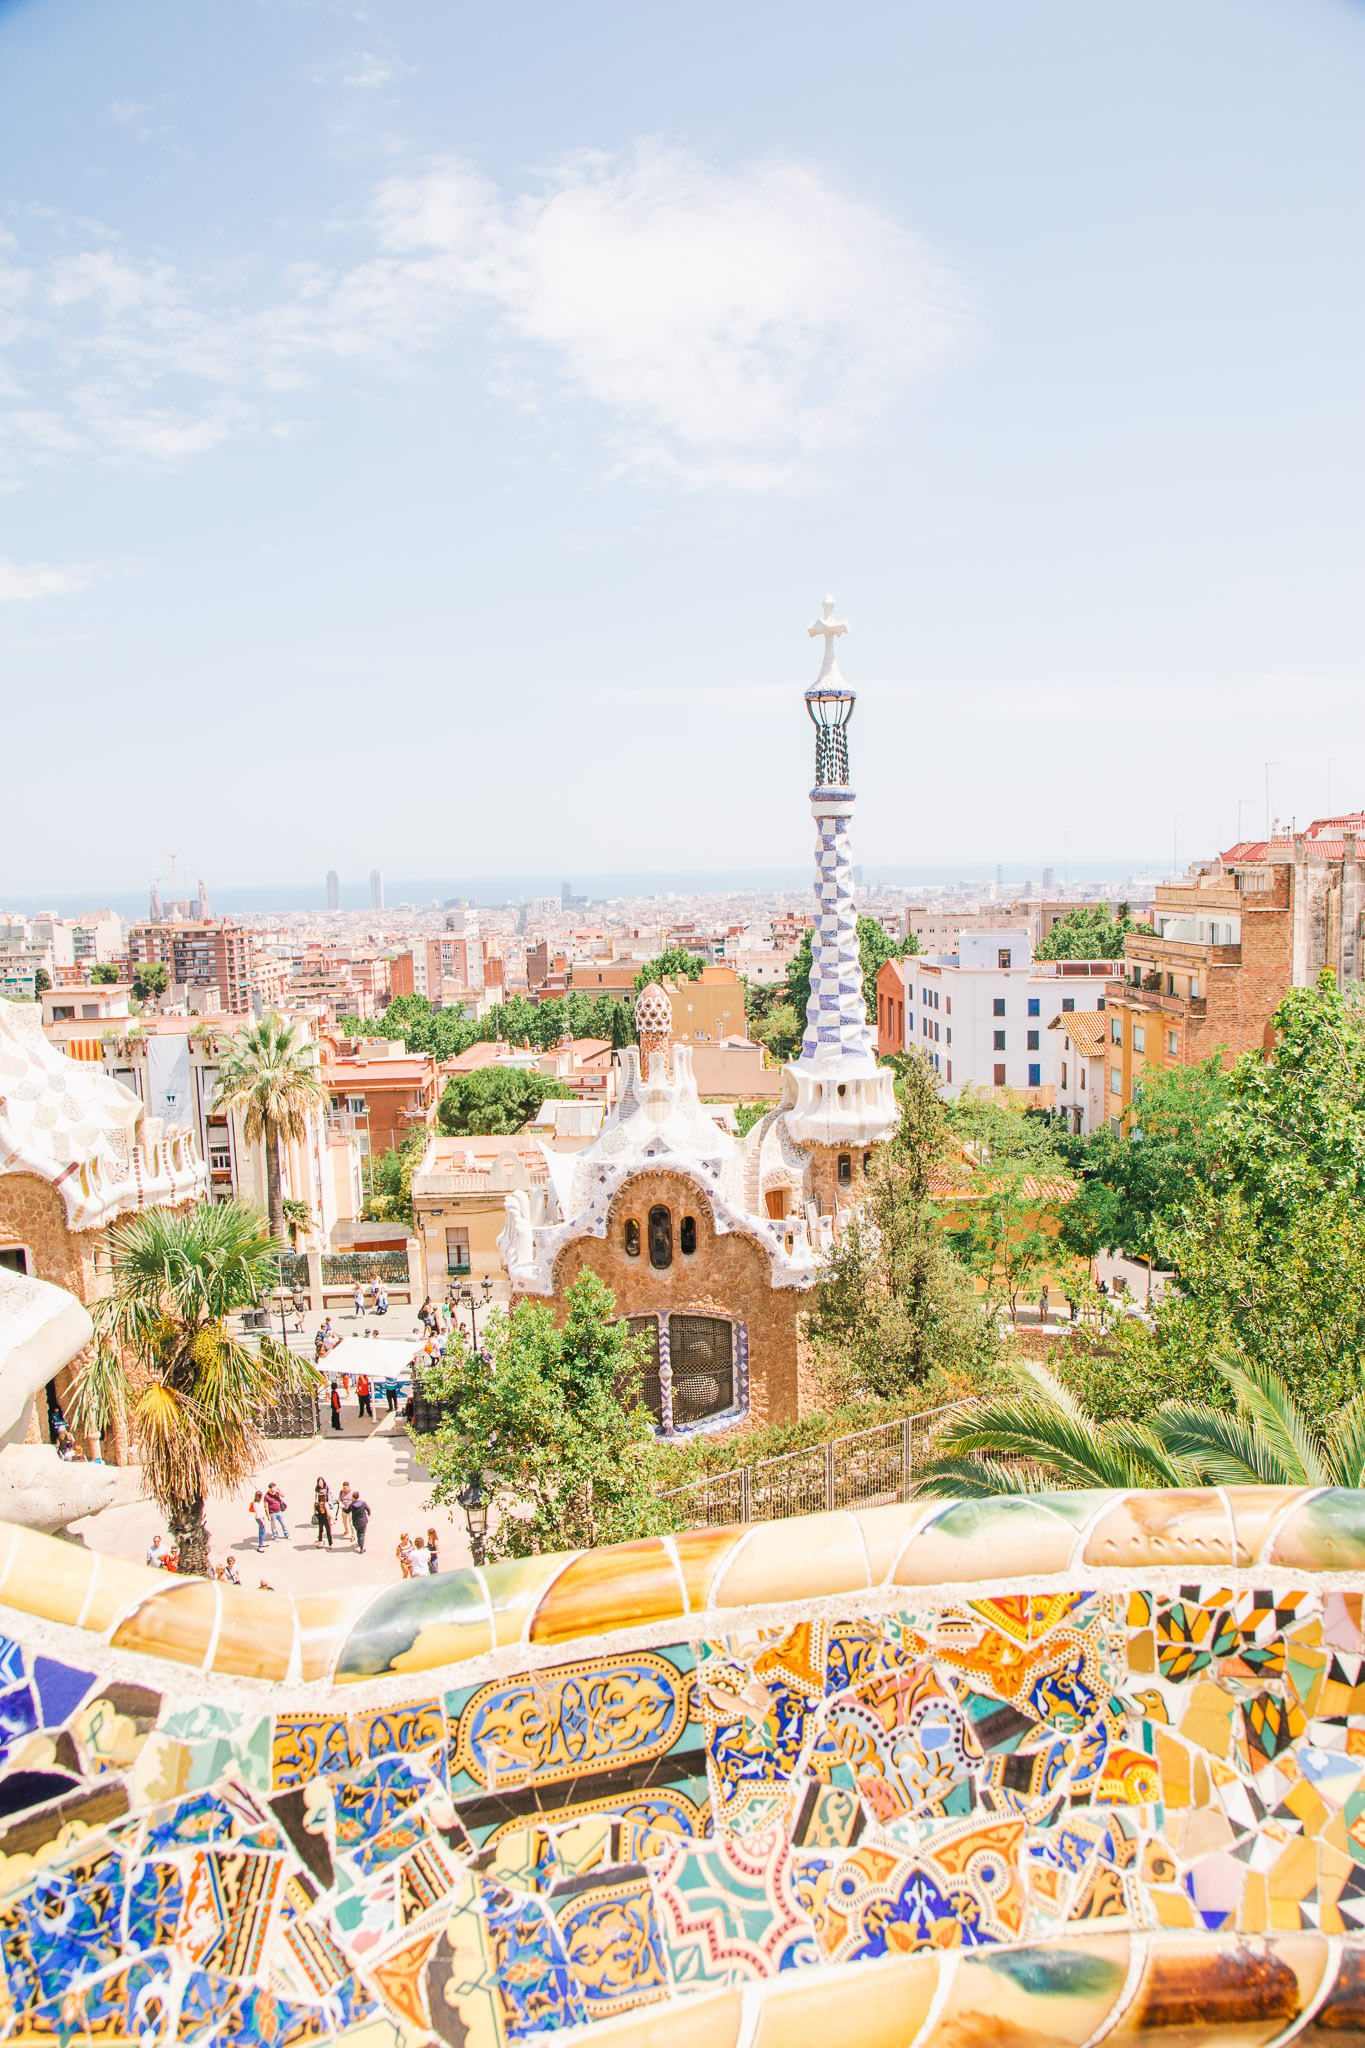 spain-barcelona-park-guell-22.jpg